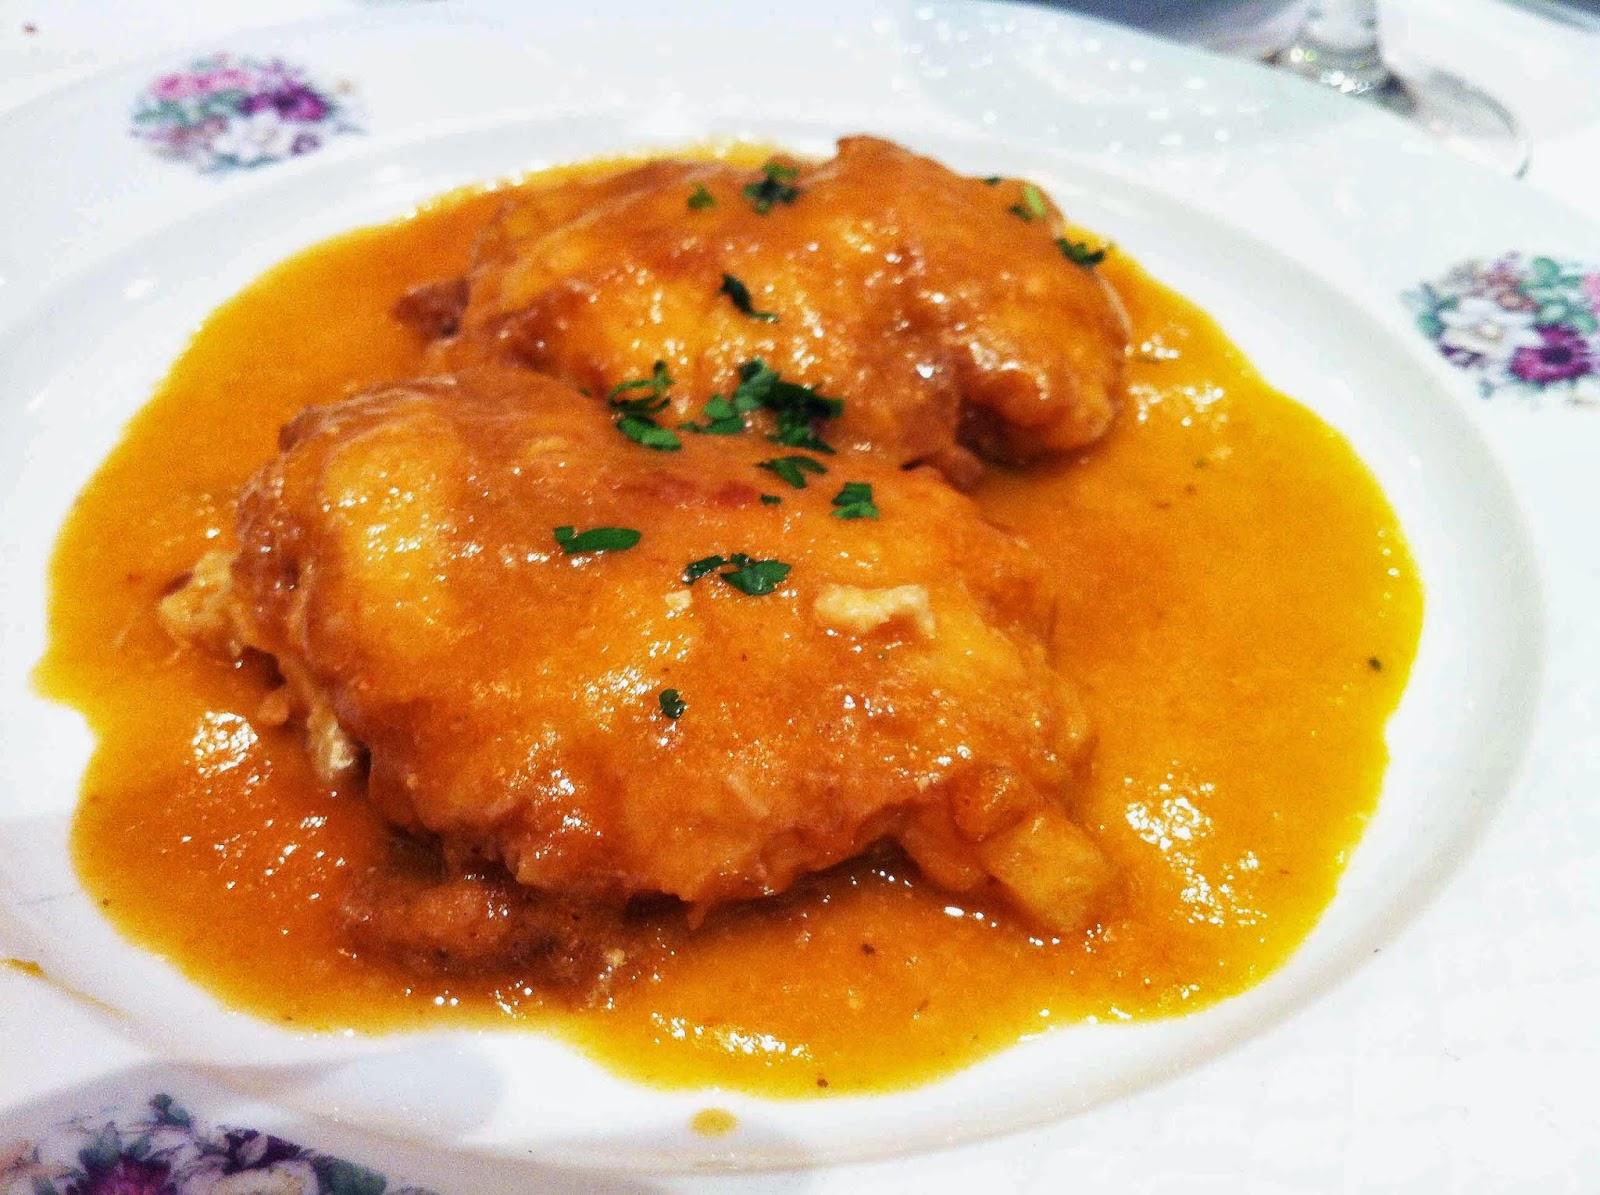 Restaurante-Oncalada-Bilbao-Merluza-Rellena-Centollo